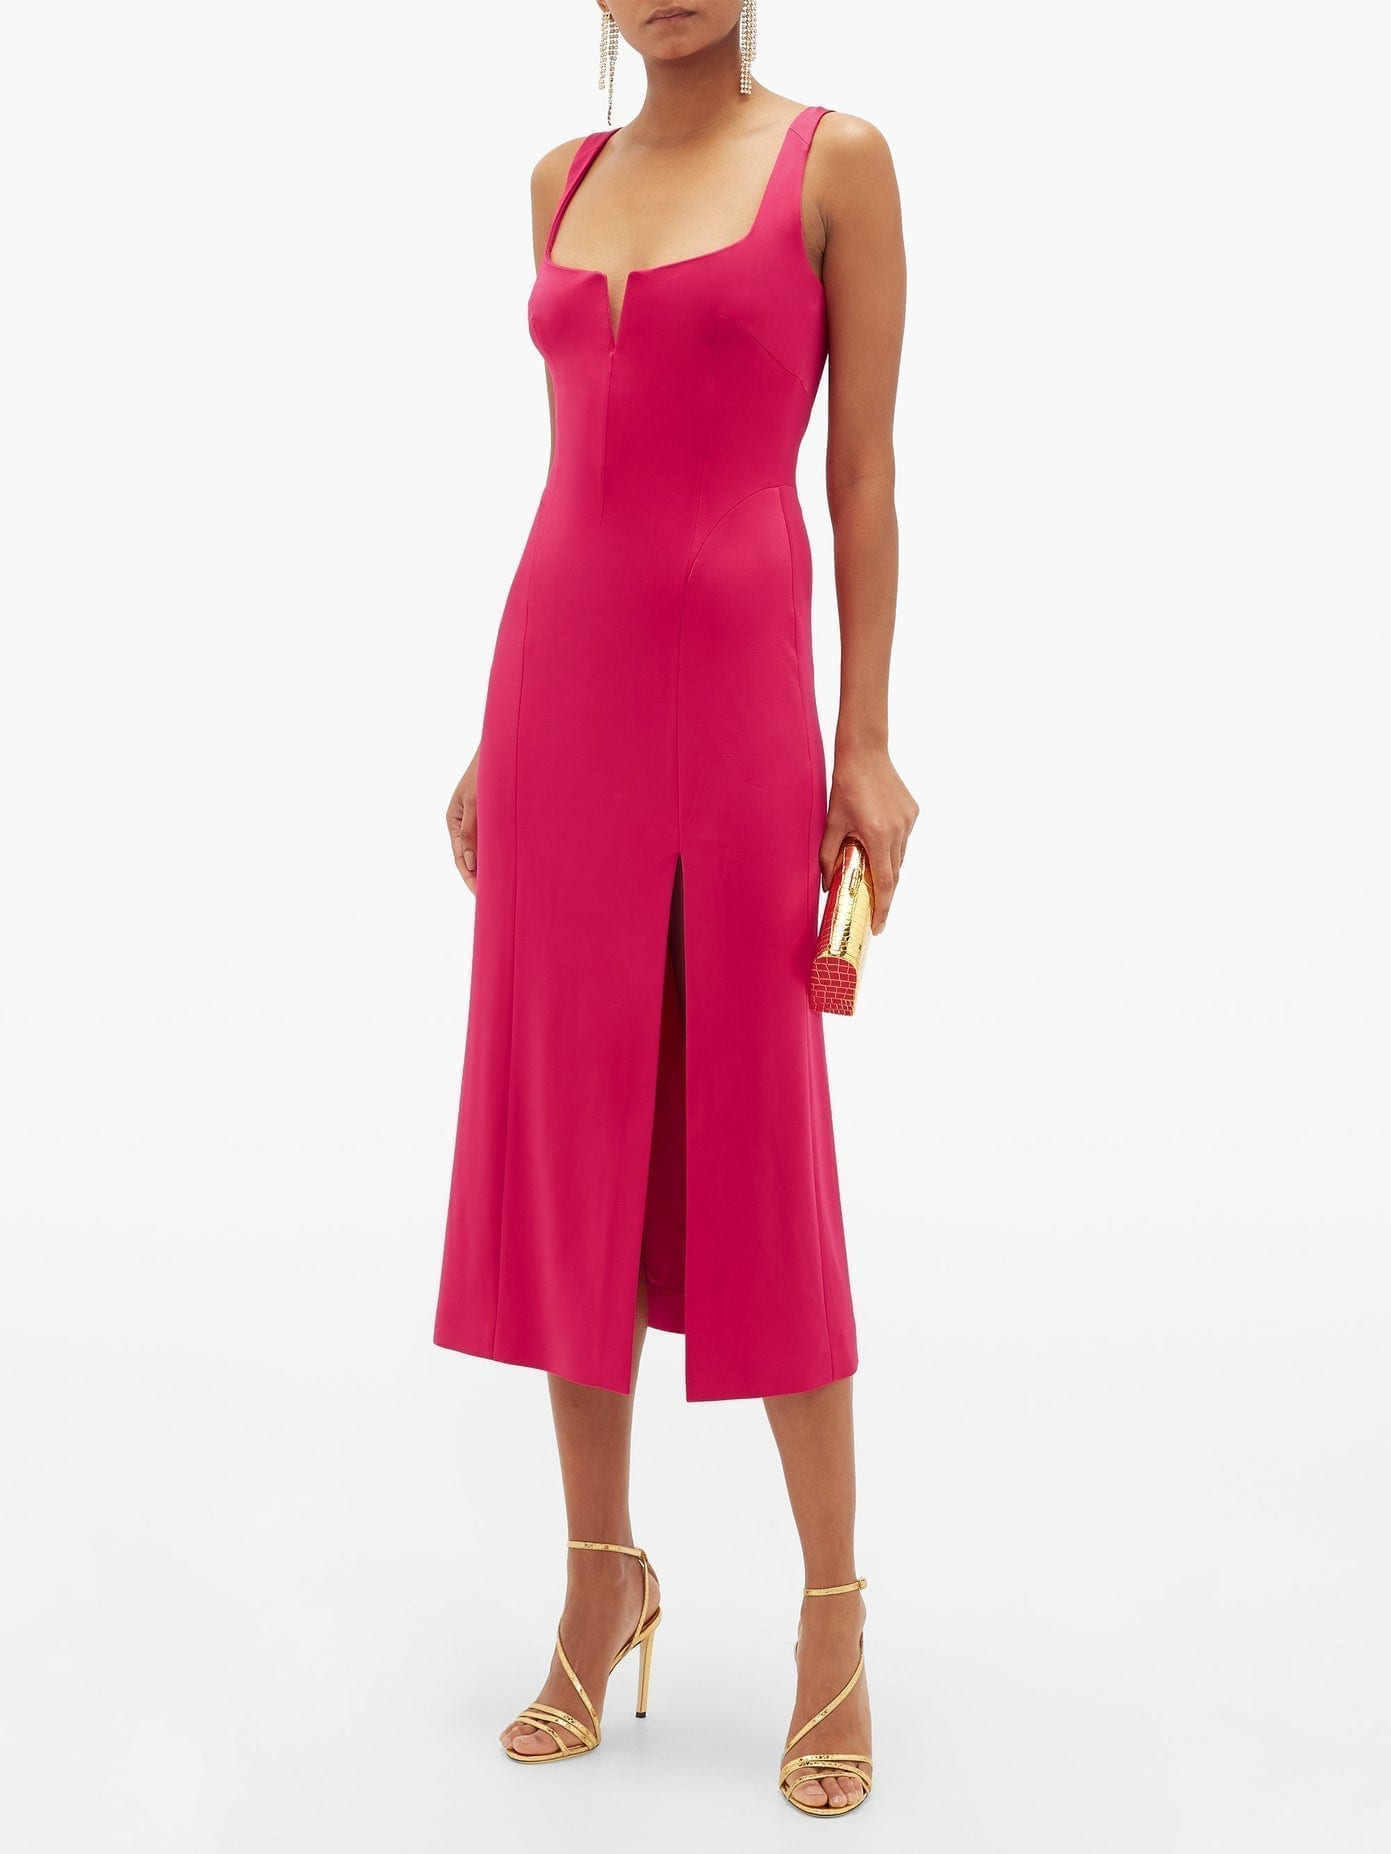 GALVAN Structured-bodice Jersey Dress